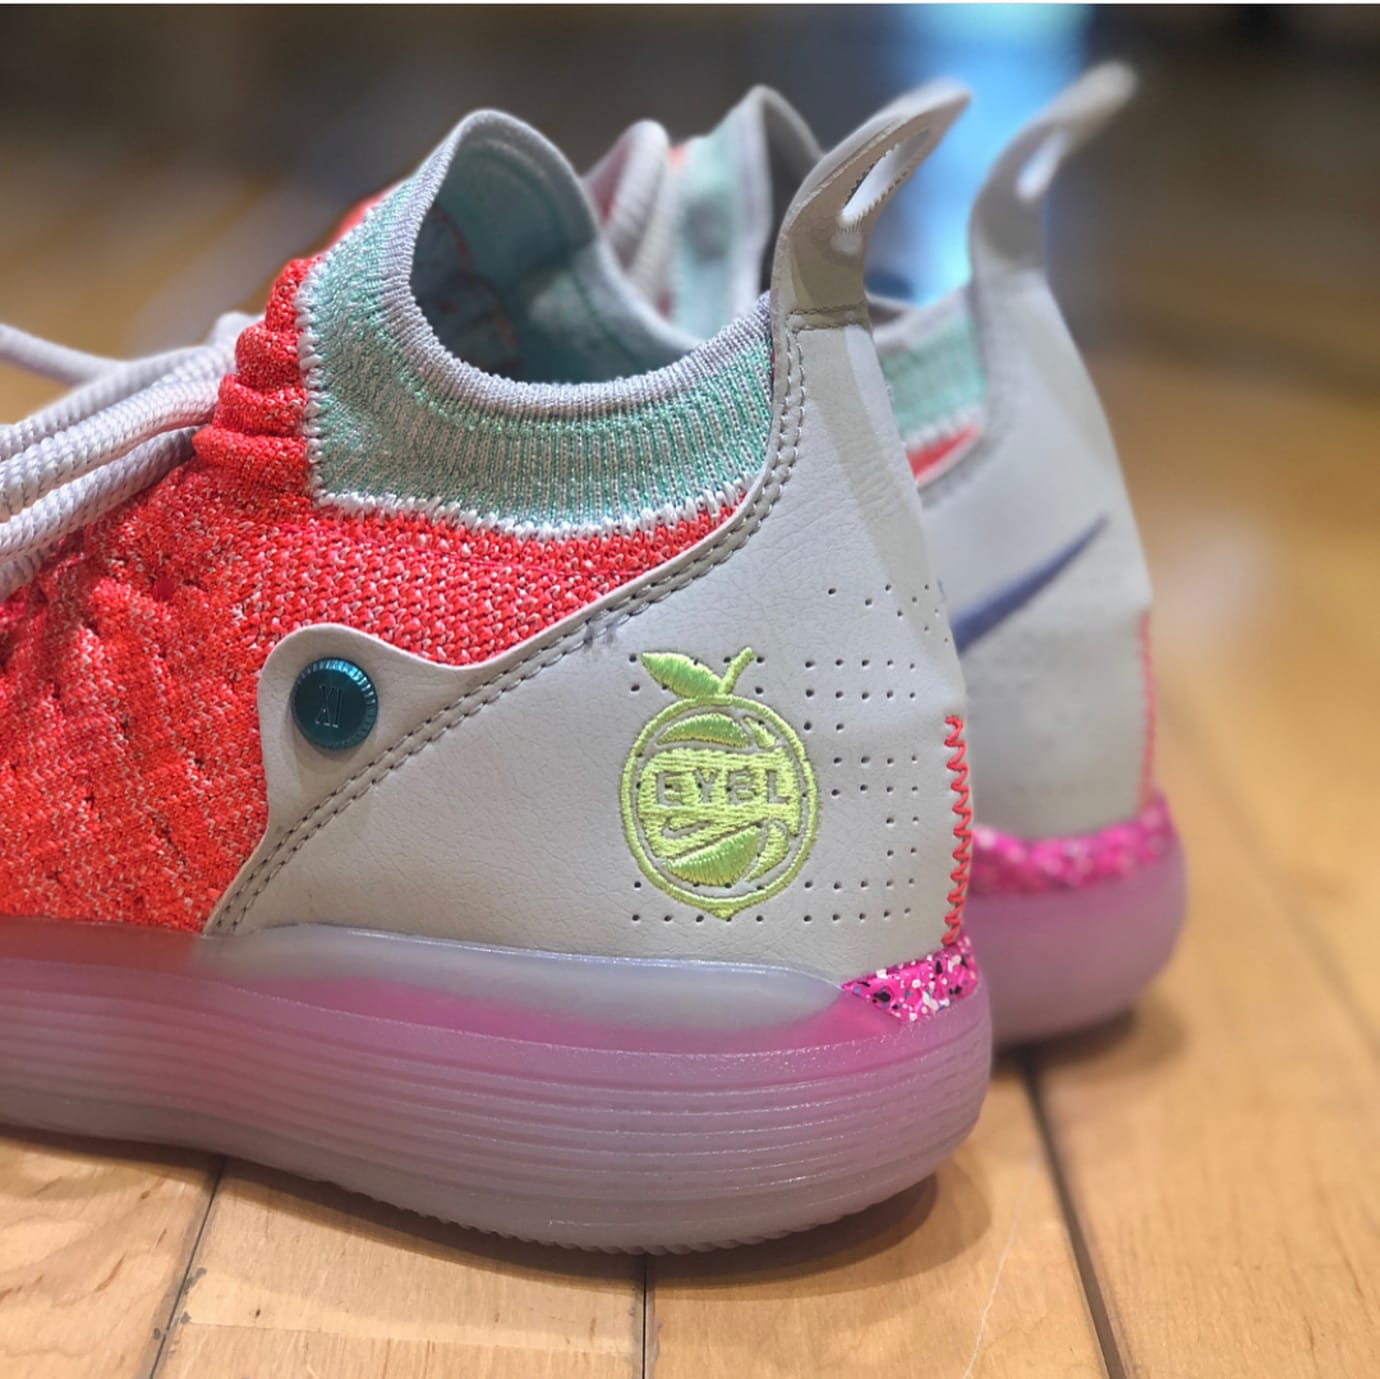 b8d1c7b25f40 Nike KD 11  EYBL  Peach Jam Release Date AO2604-600